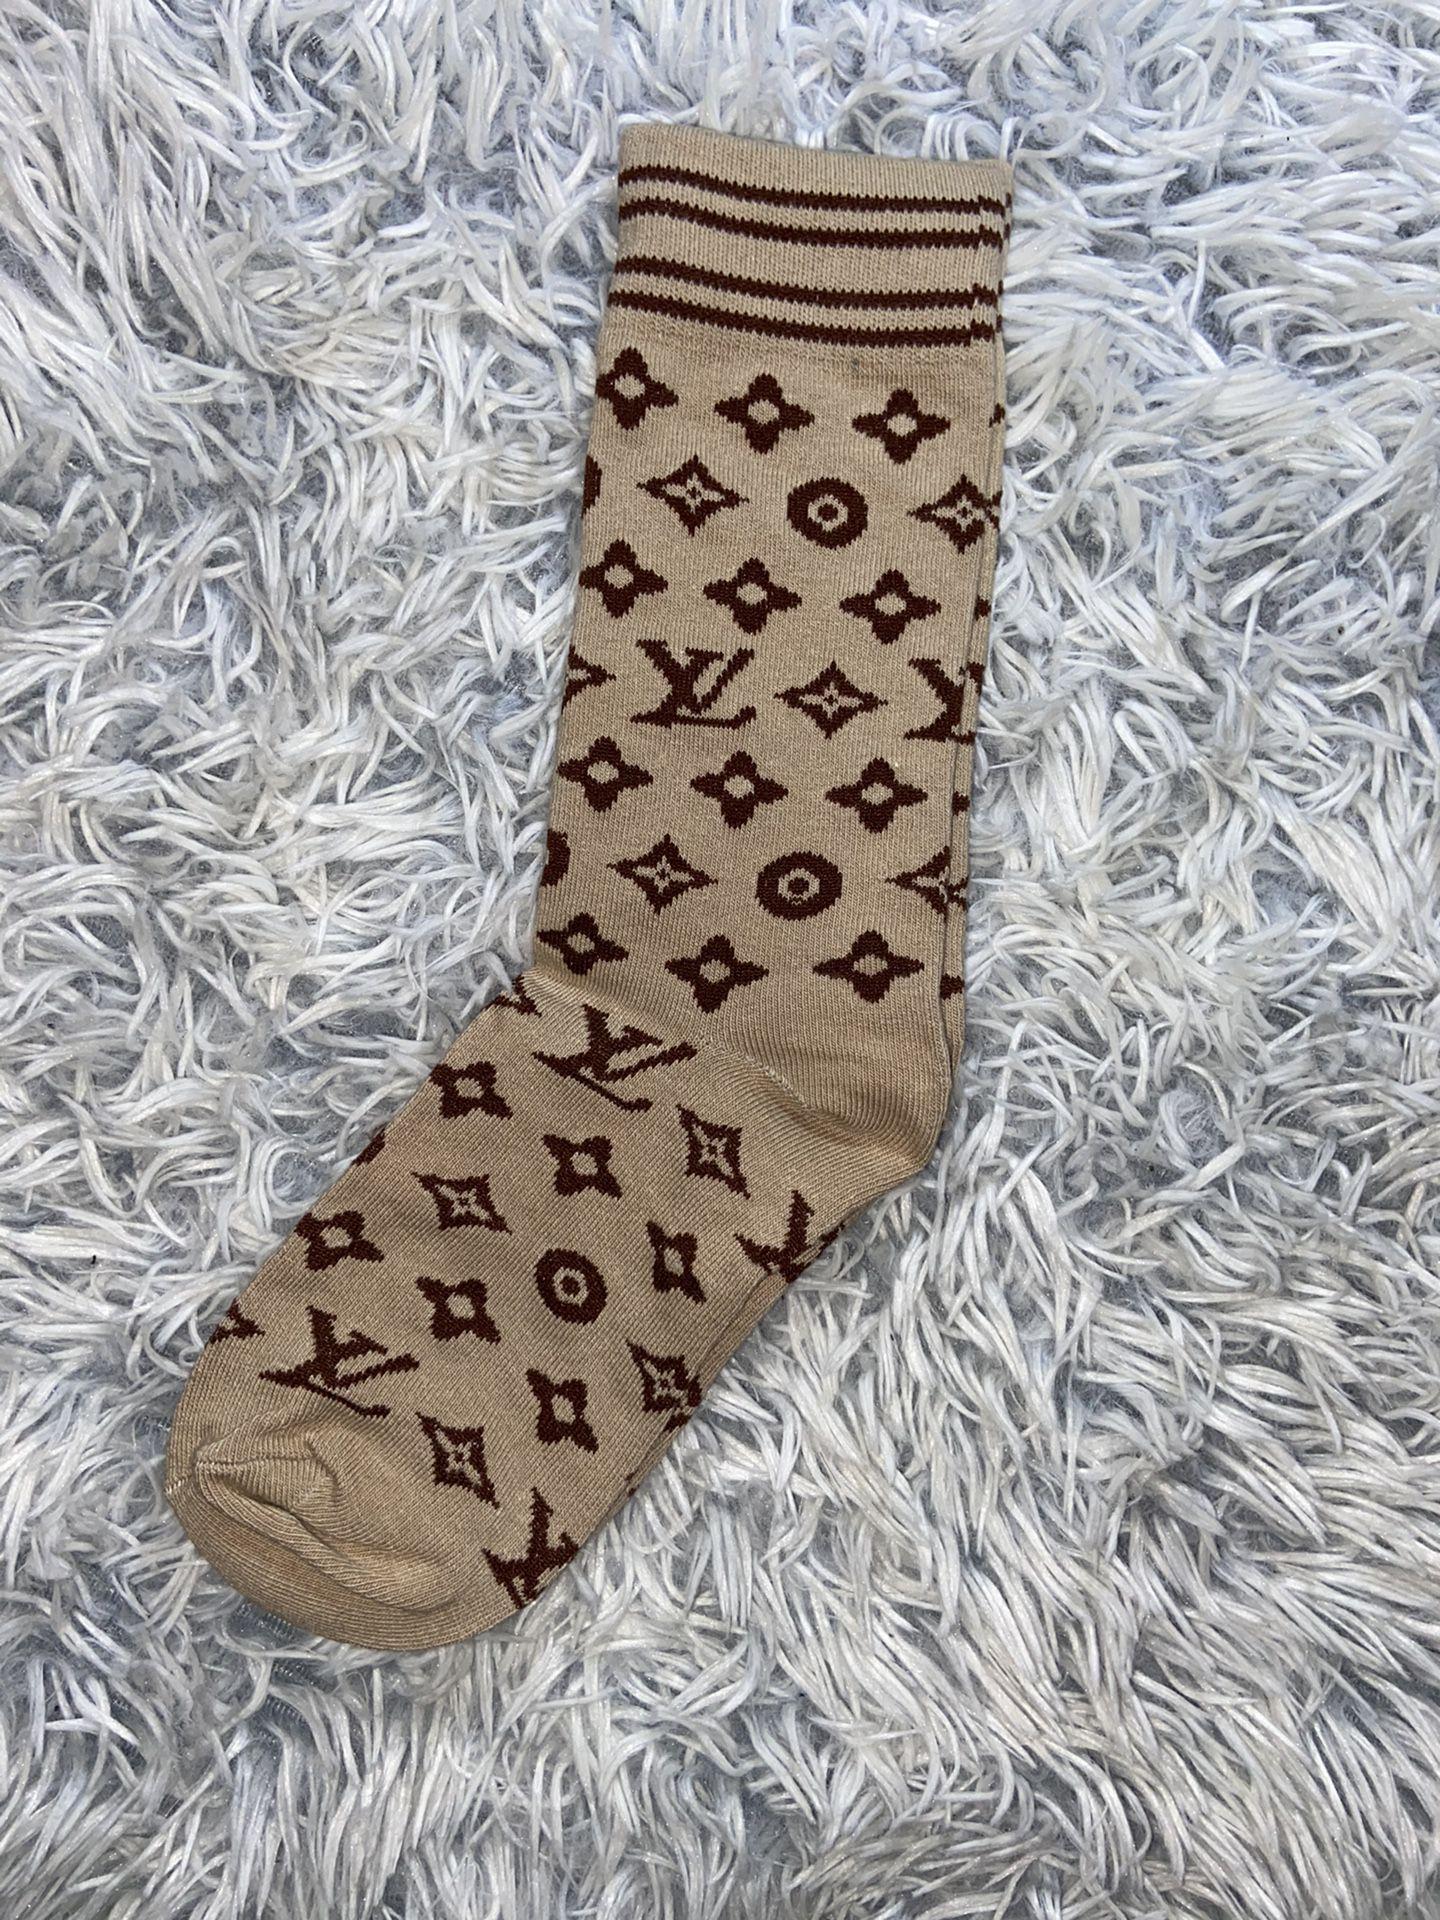 5 Louis Vuitton Socks